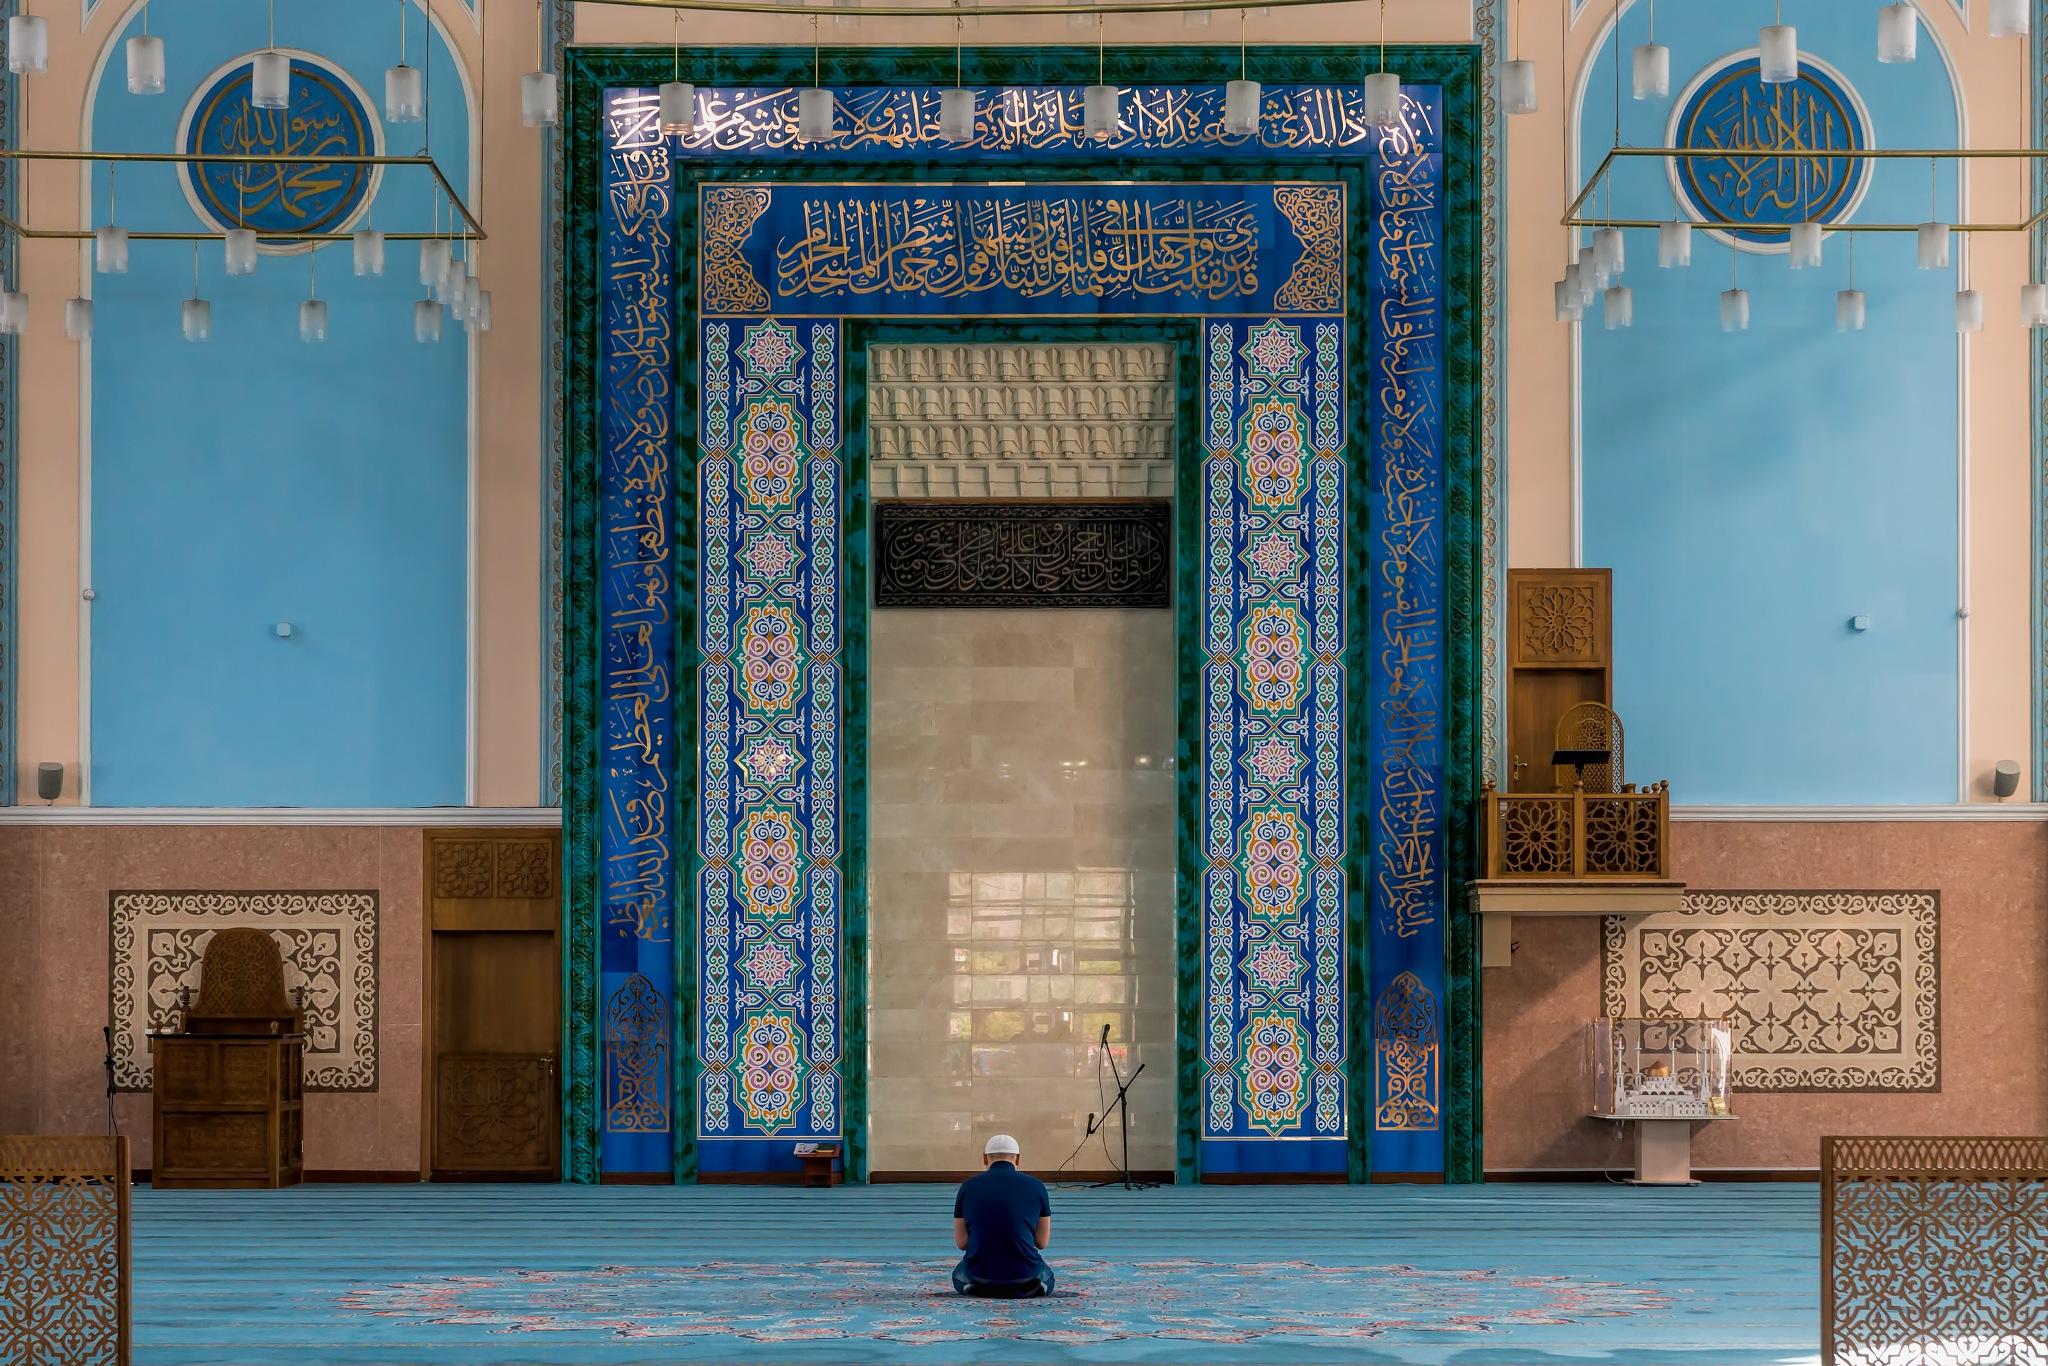 Nur Astana Mosque, Astana by deeejay